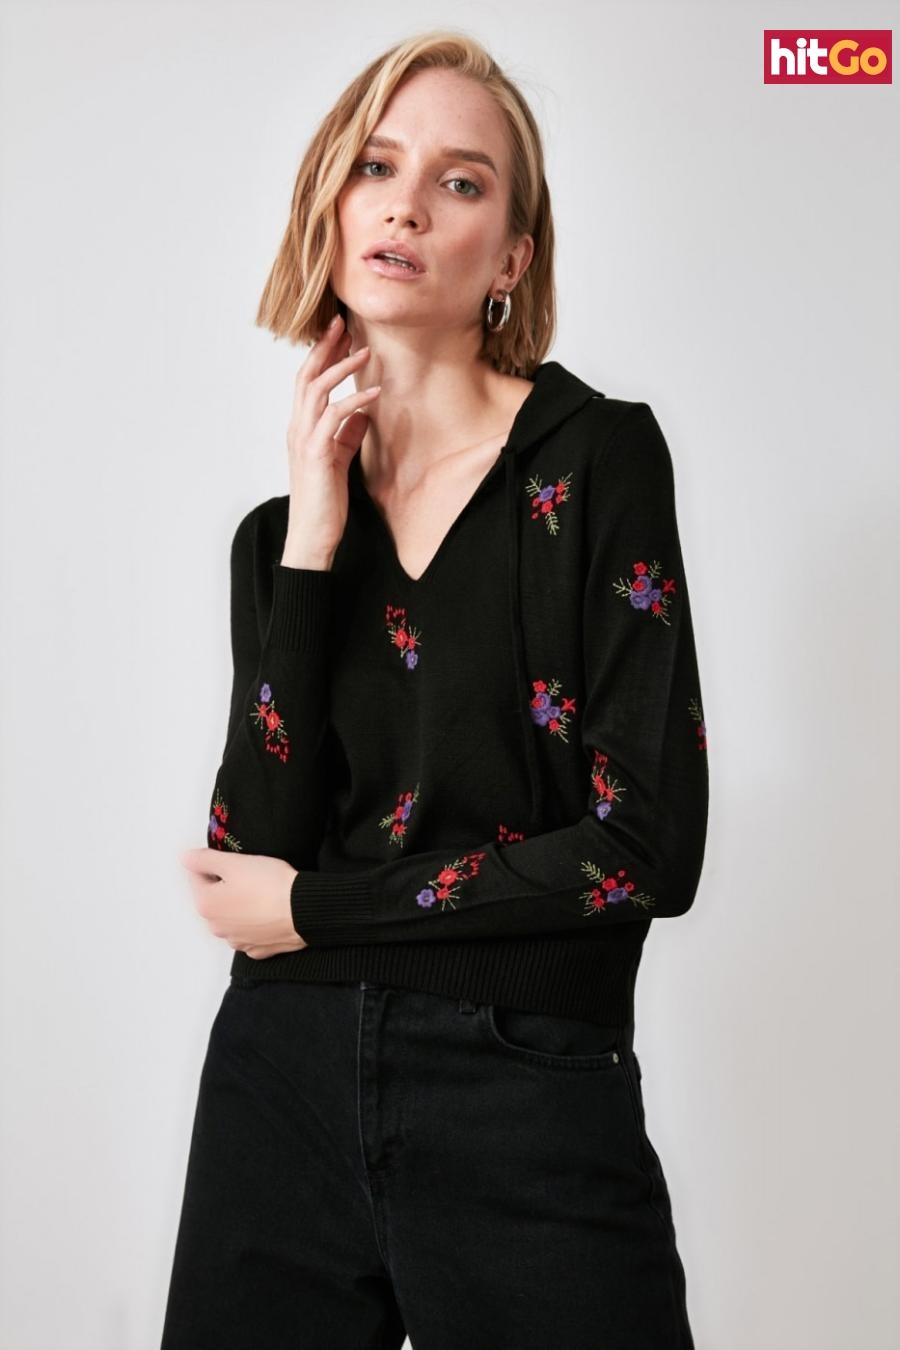 Trendyol Knitwear Sweater with Black Floral Embroidery dámské L